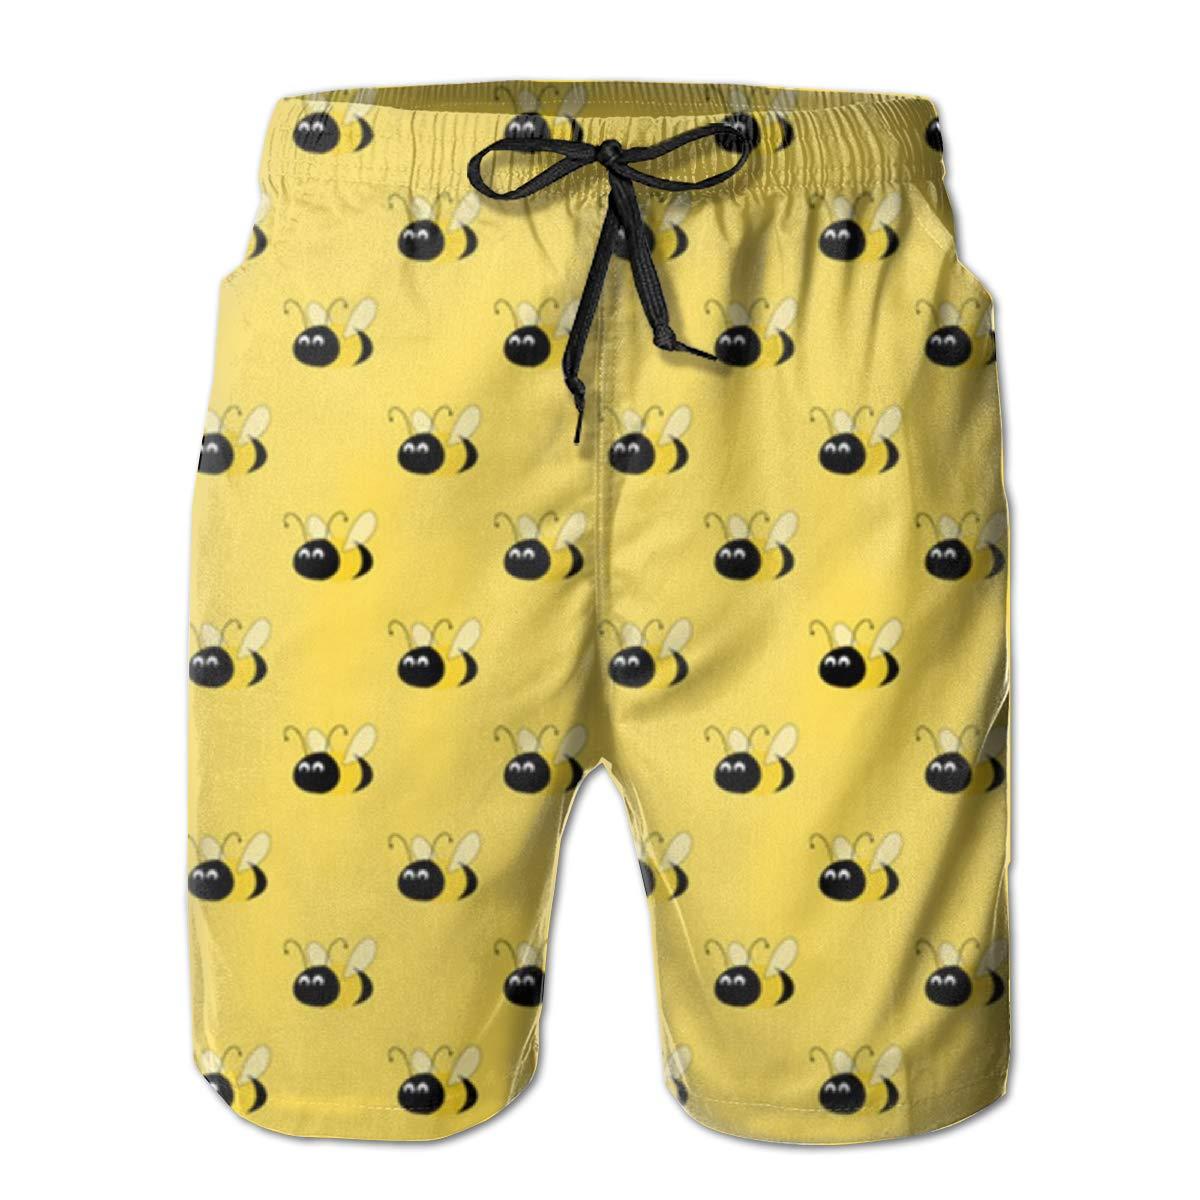 Bumblebee Yellow Mens Swim Trunks Beach Shorts with Mesh Lining Boardshort